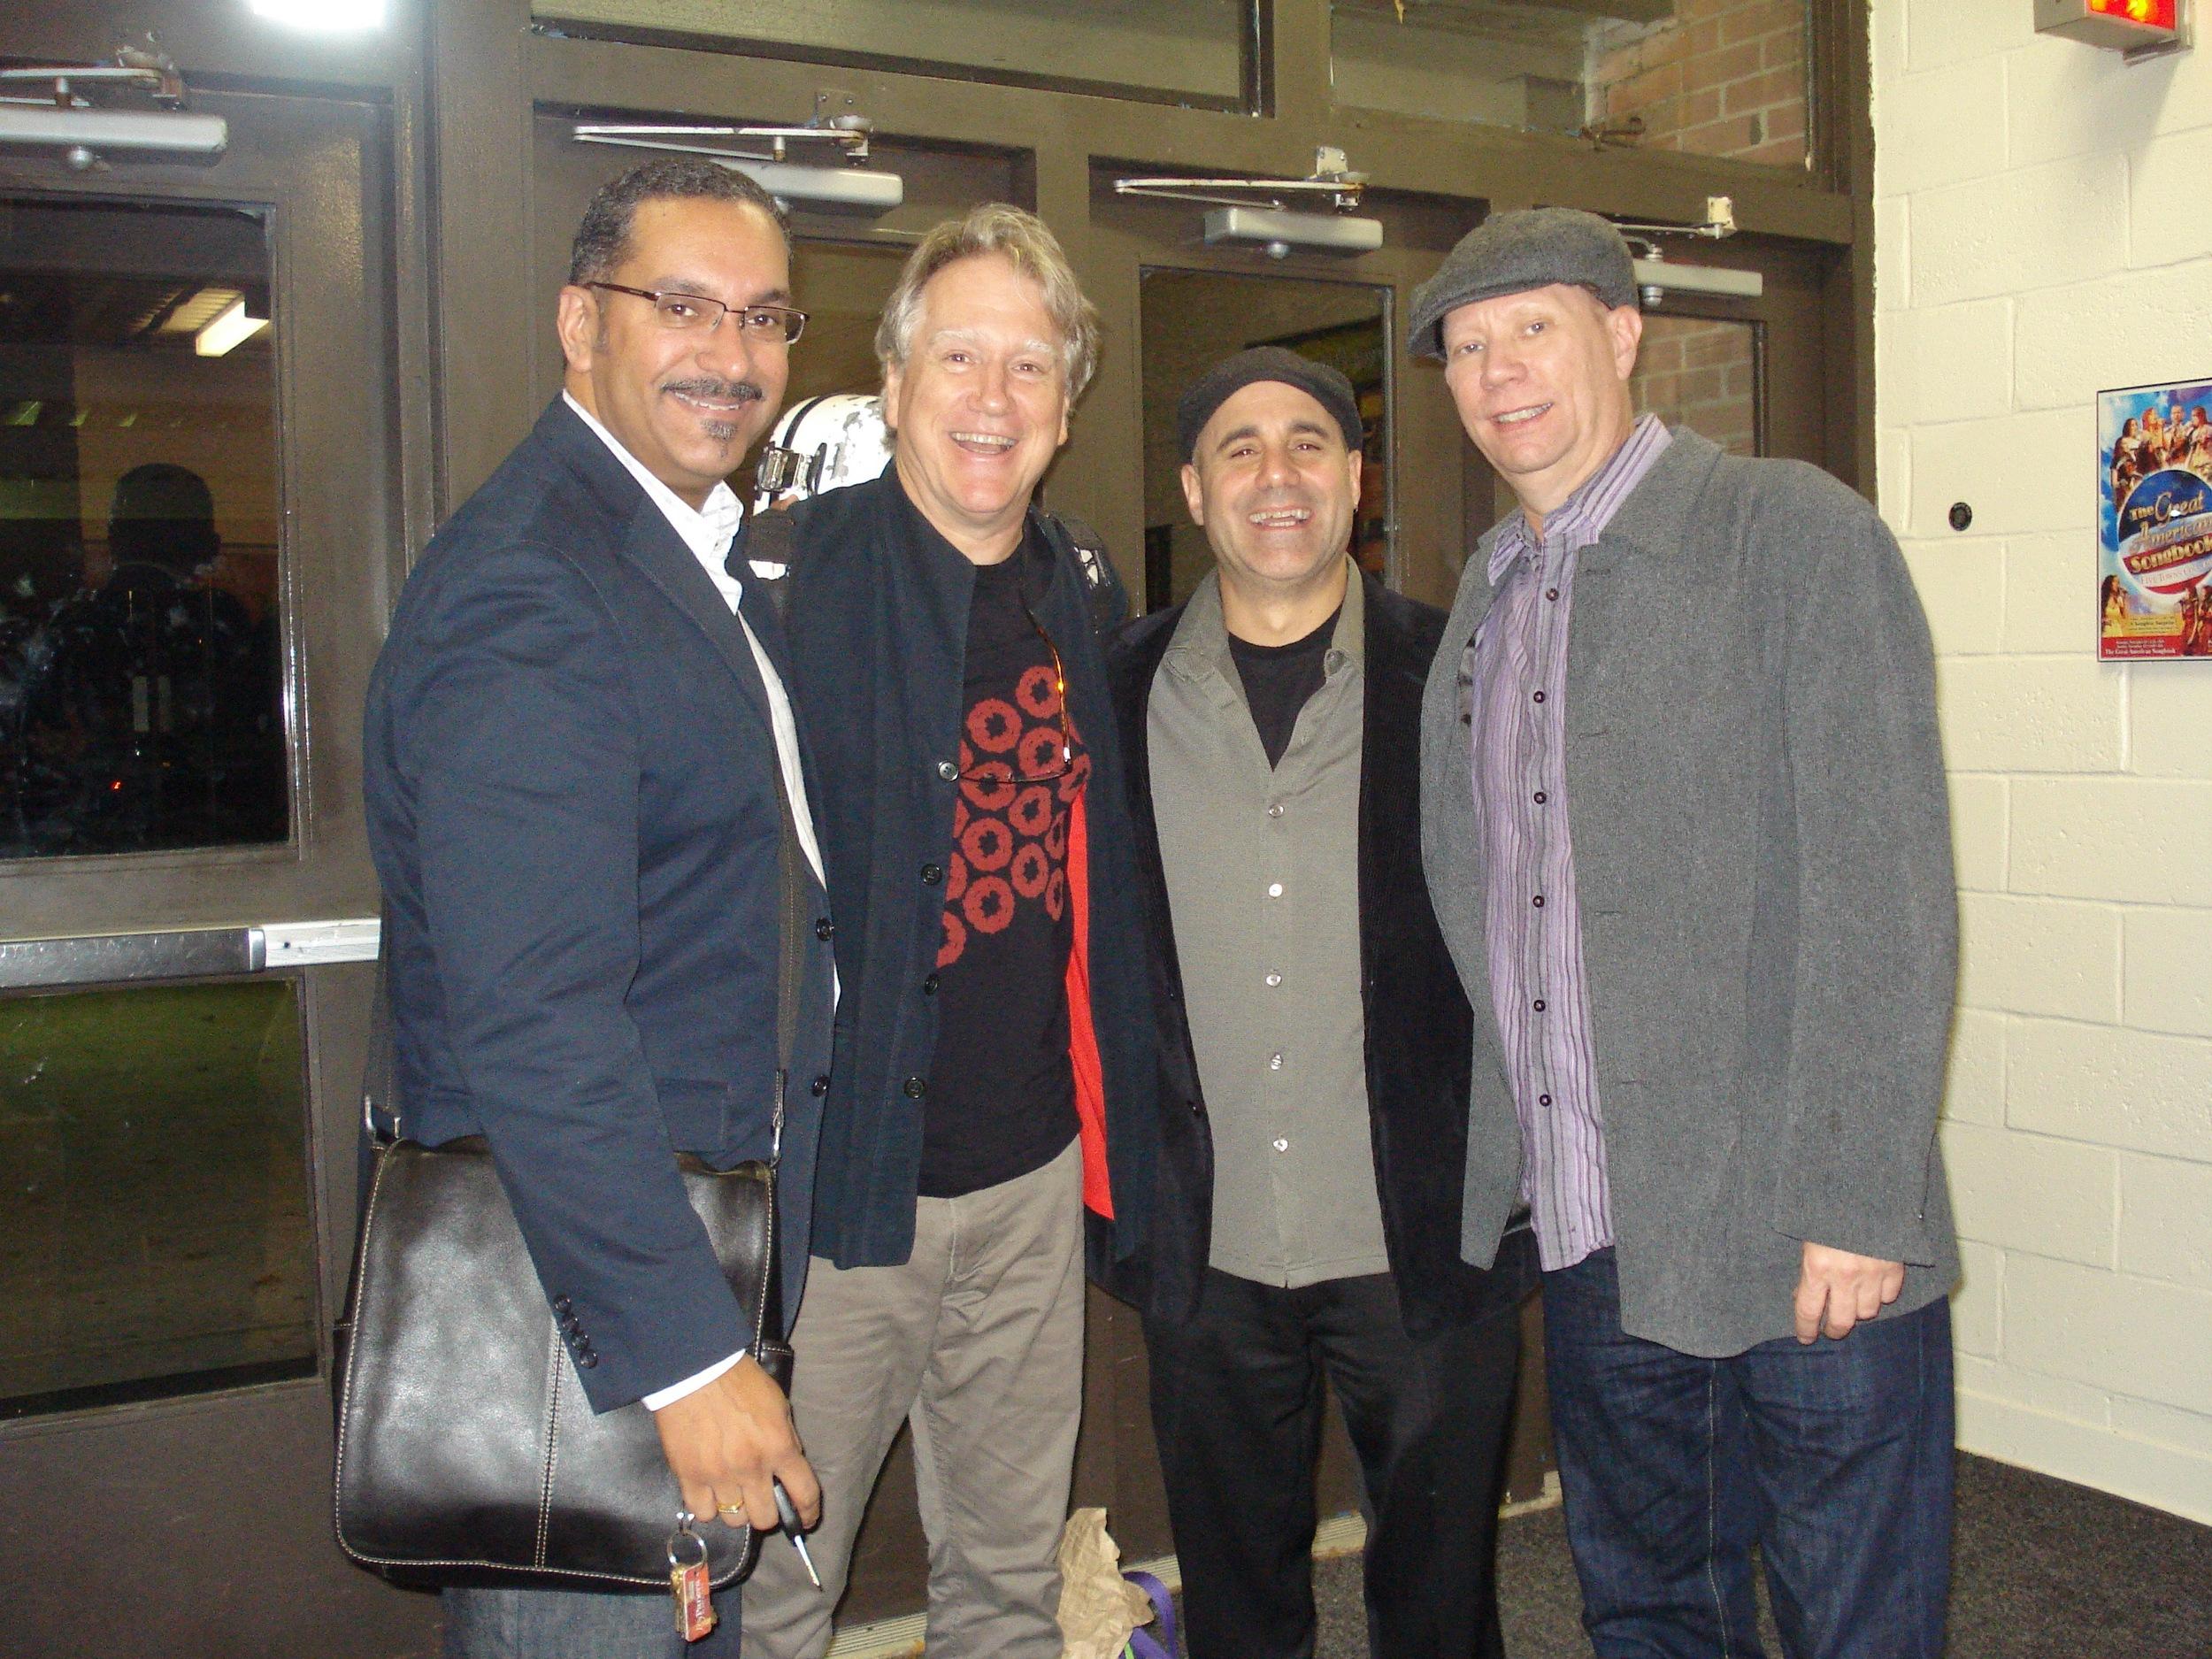 Ben Verdery, Tony Romano & Paul Bollenbach